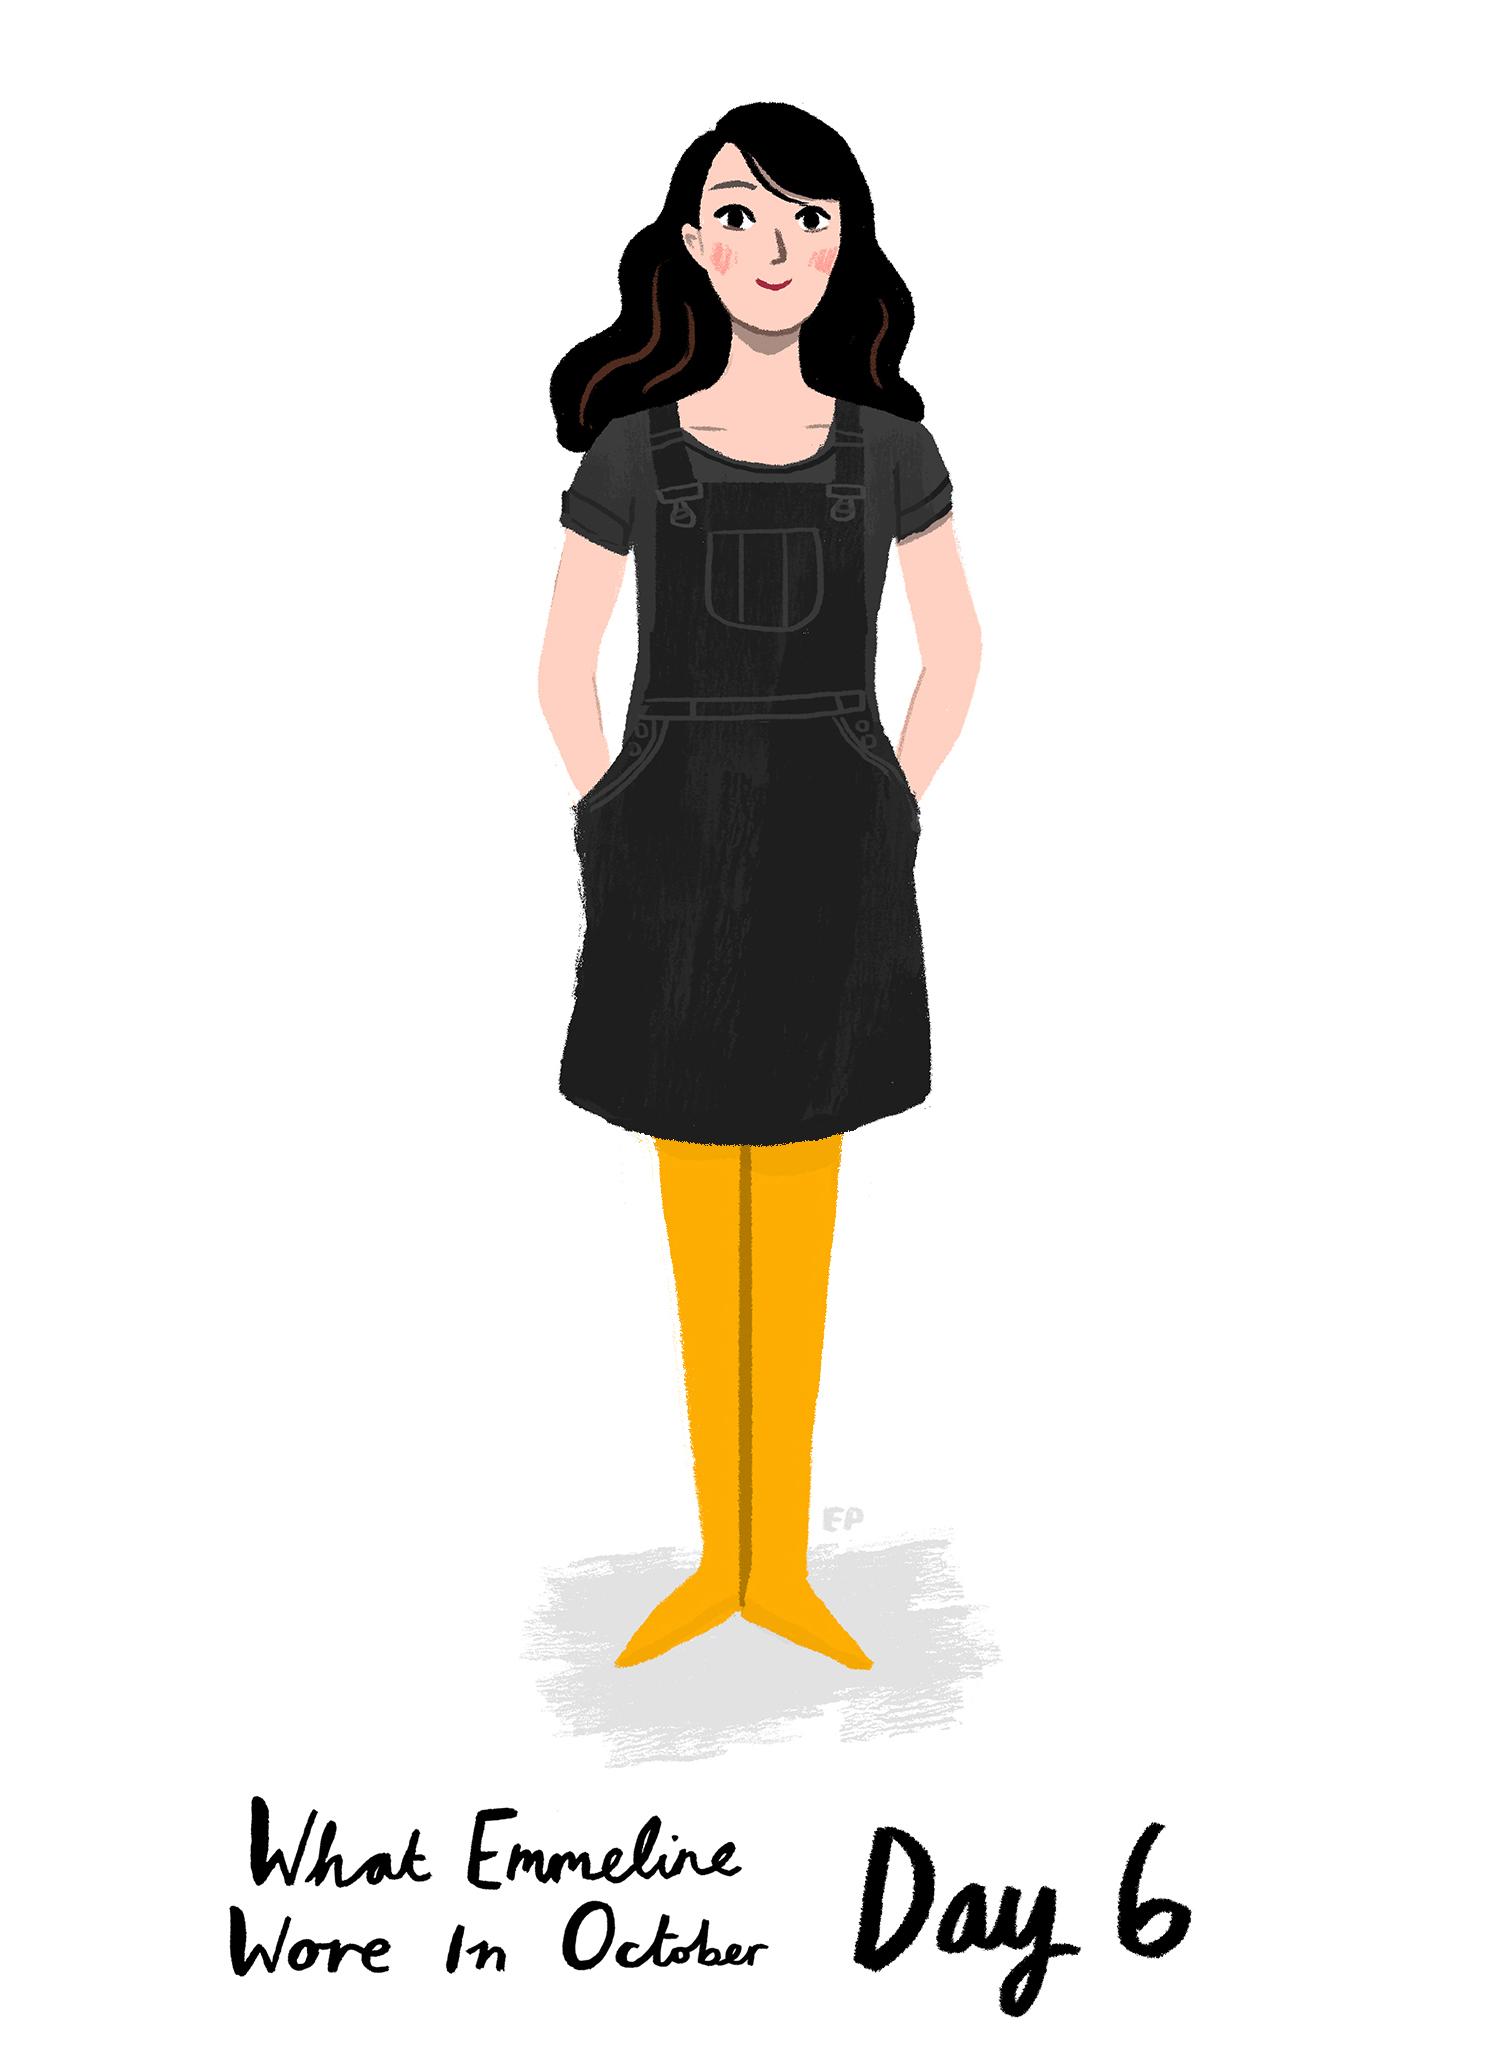 what-emmeline-wore-in-october-illustration-day-6